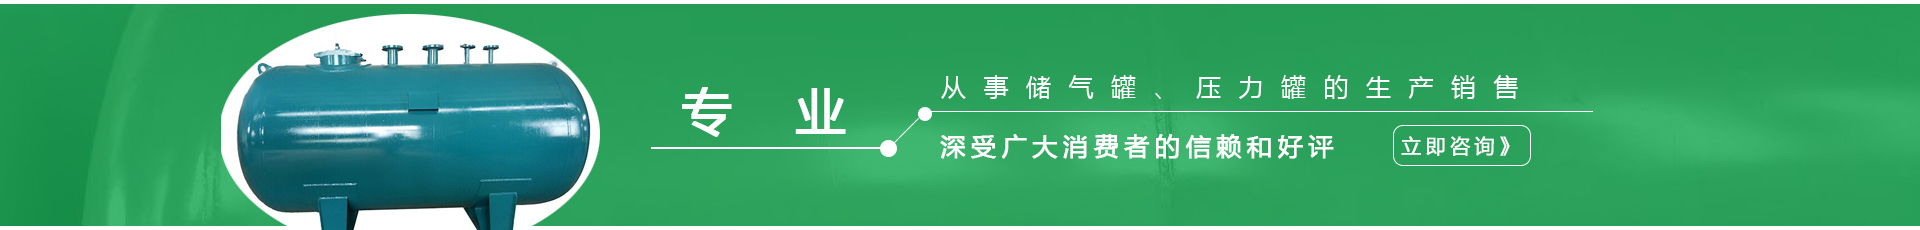 裕蓝田储气罐